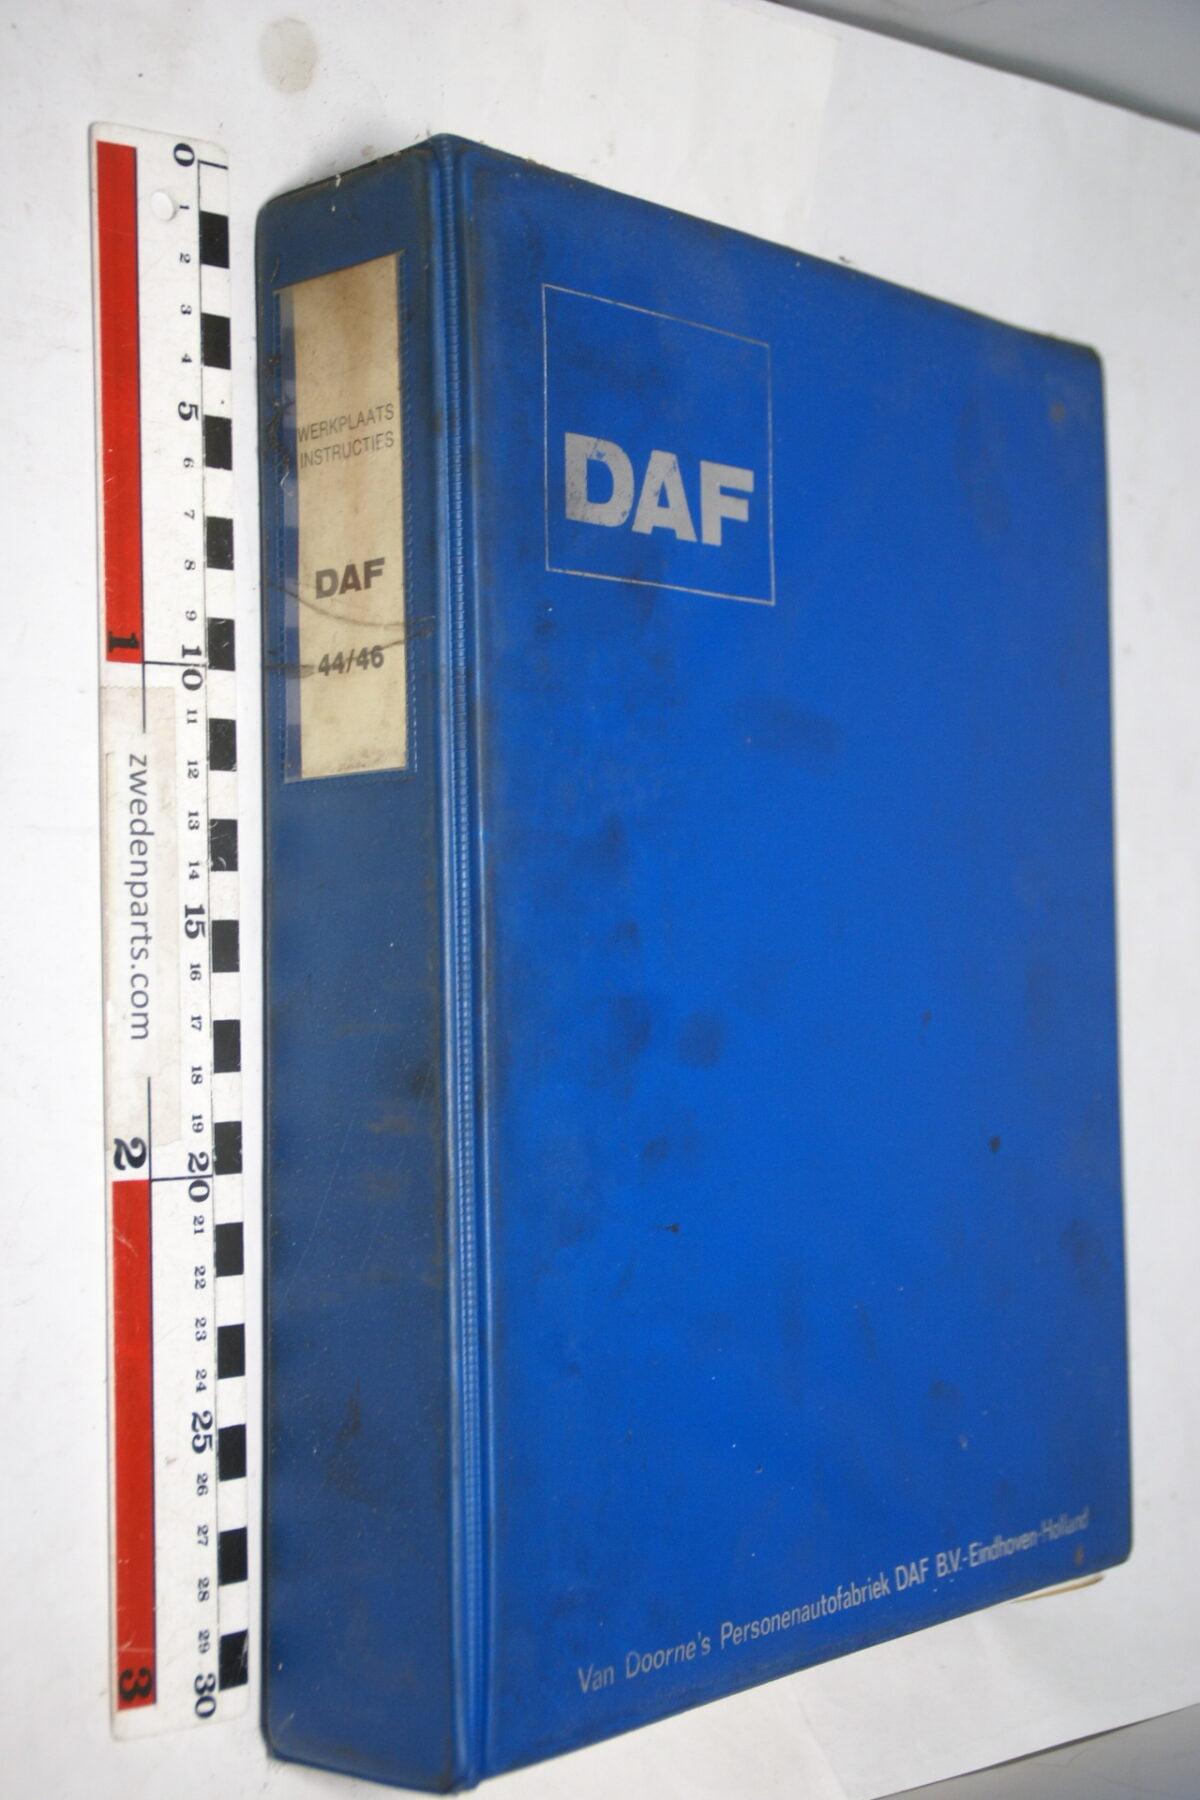 DSC01301 origineel DAF 44 46 werkplaatshandboek-fd3d11f7